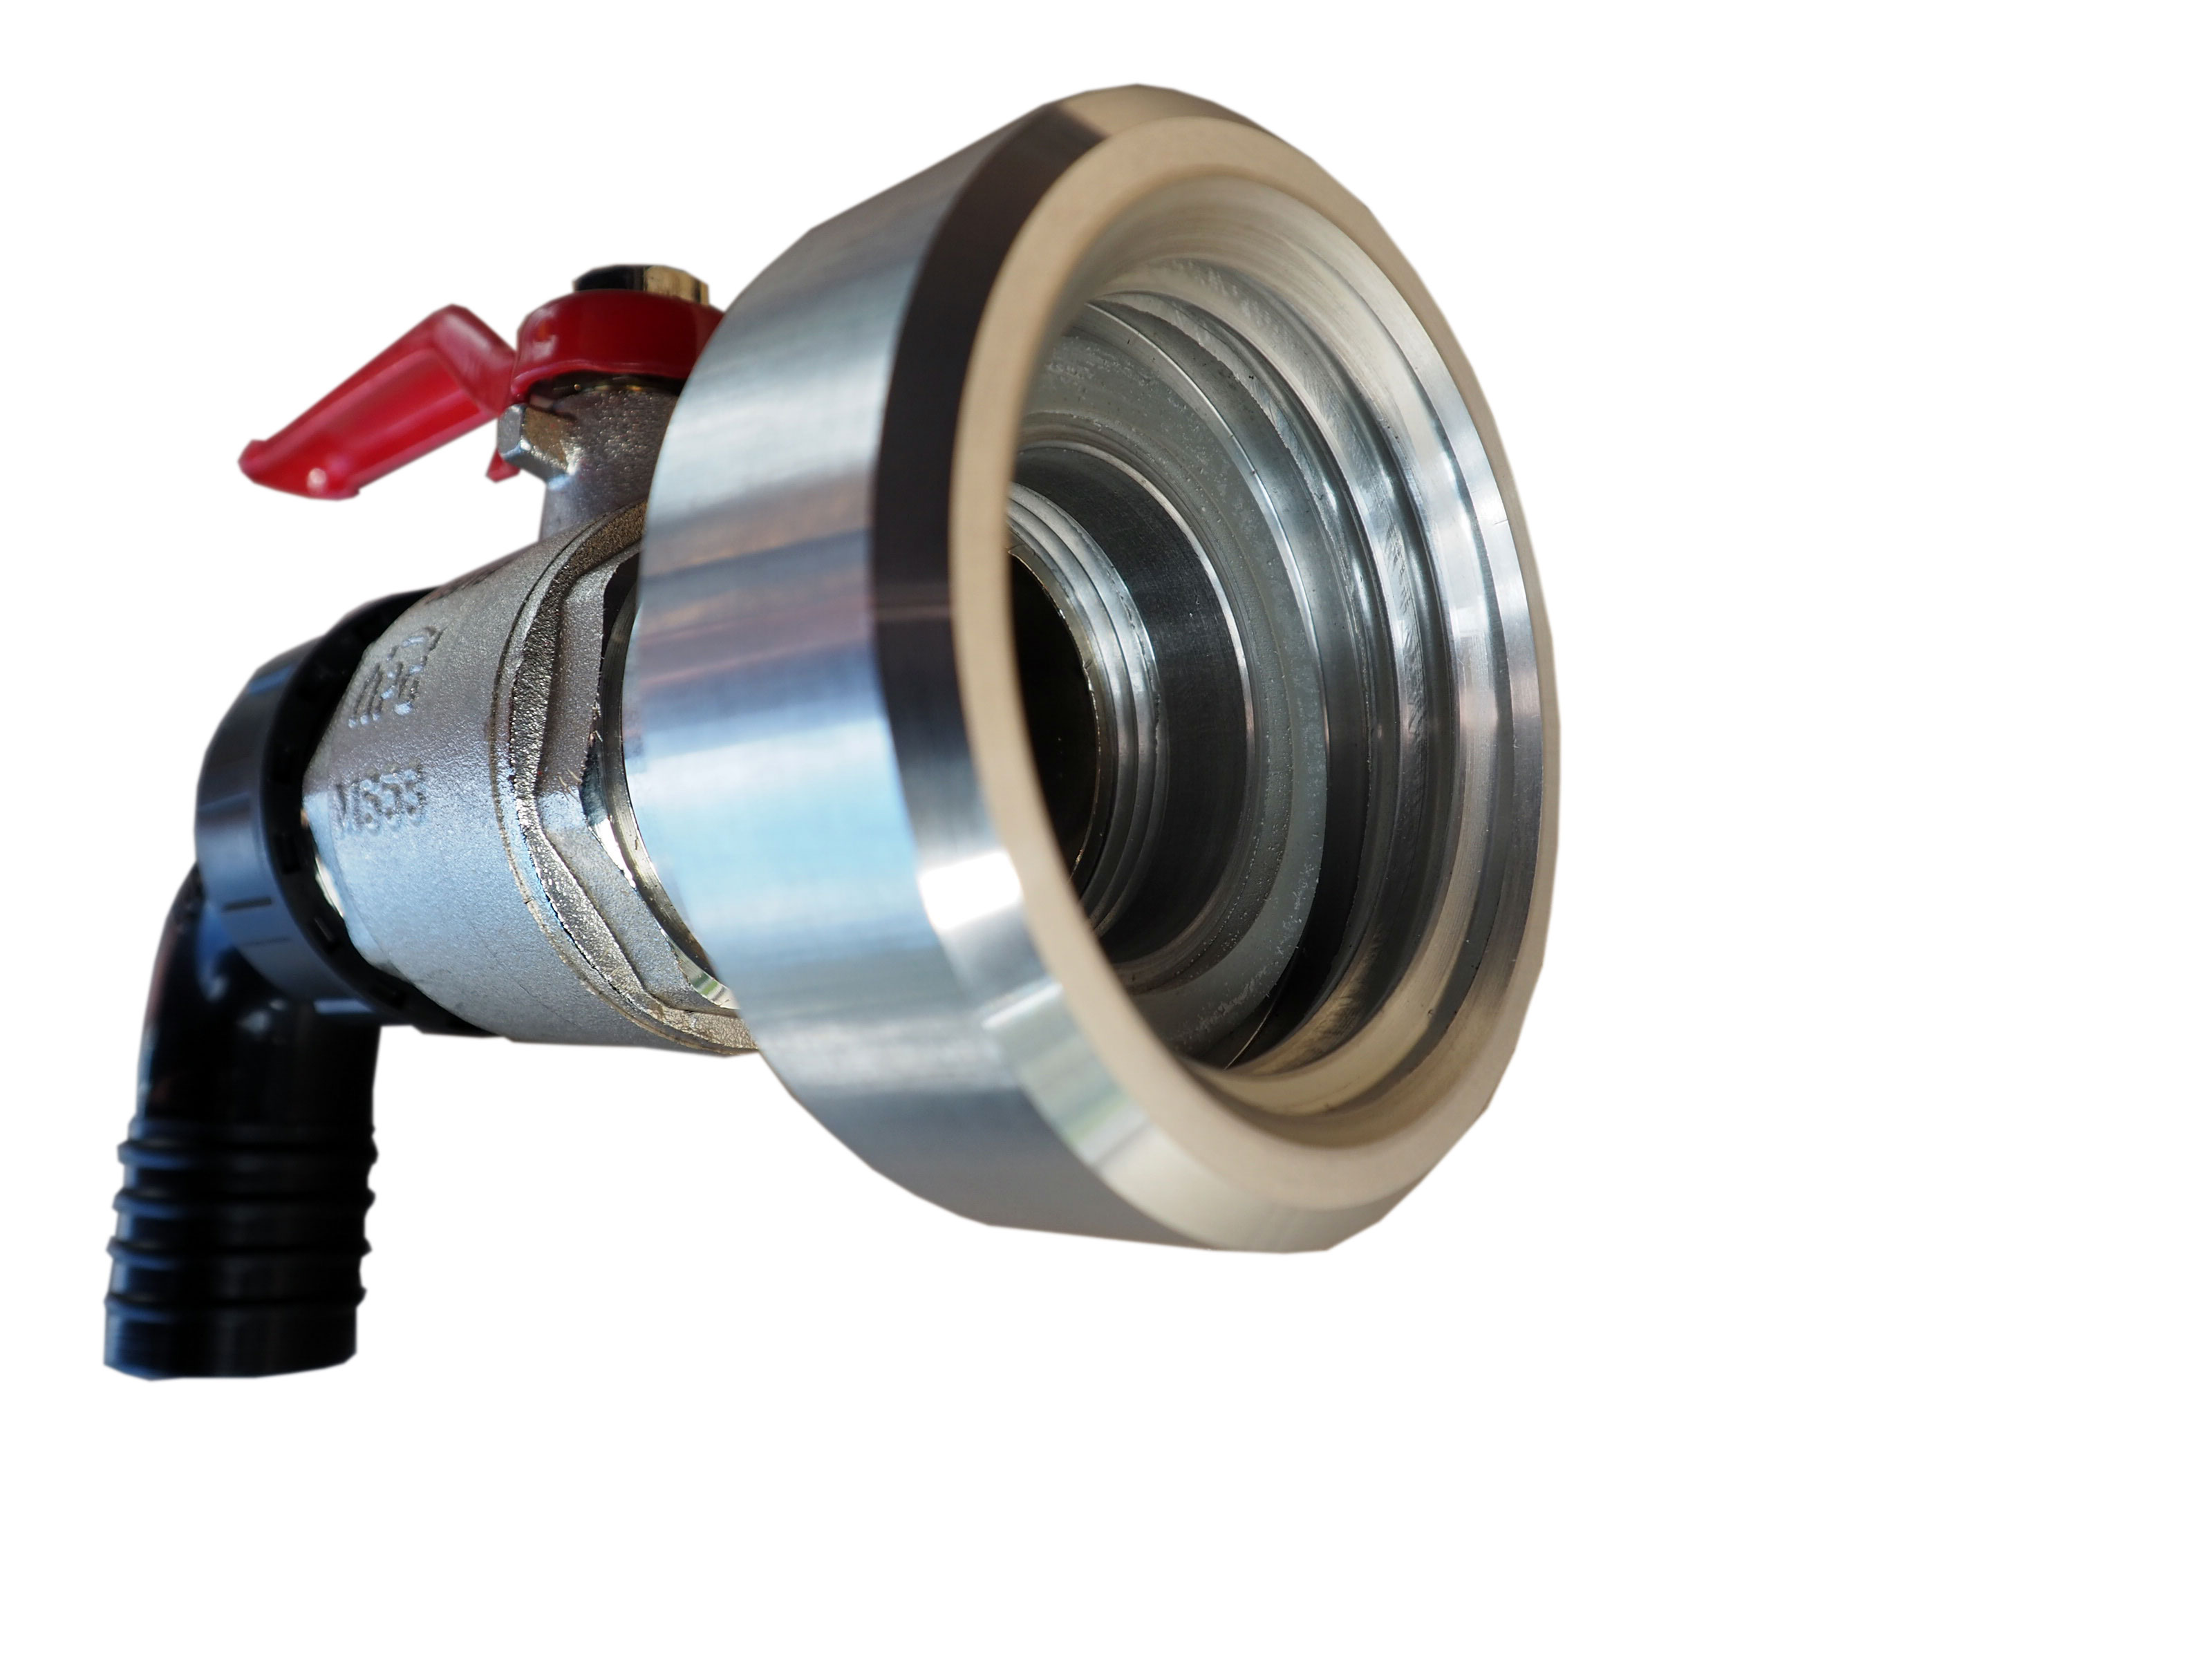 IBC Auslaufhahn komplett - Aluminium Reduzierung